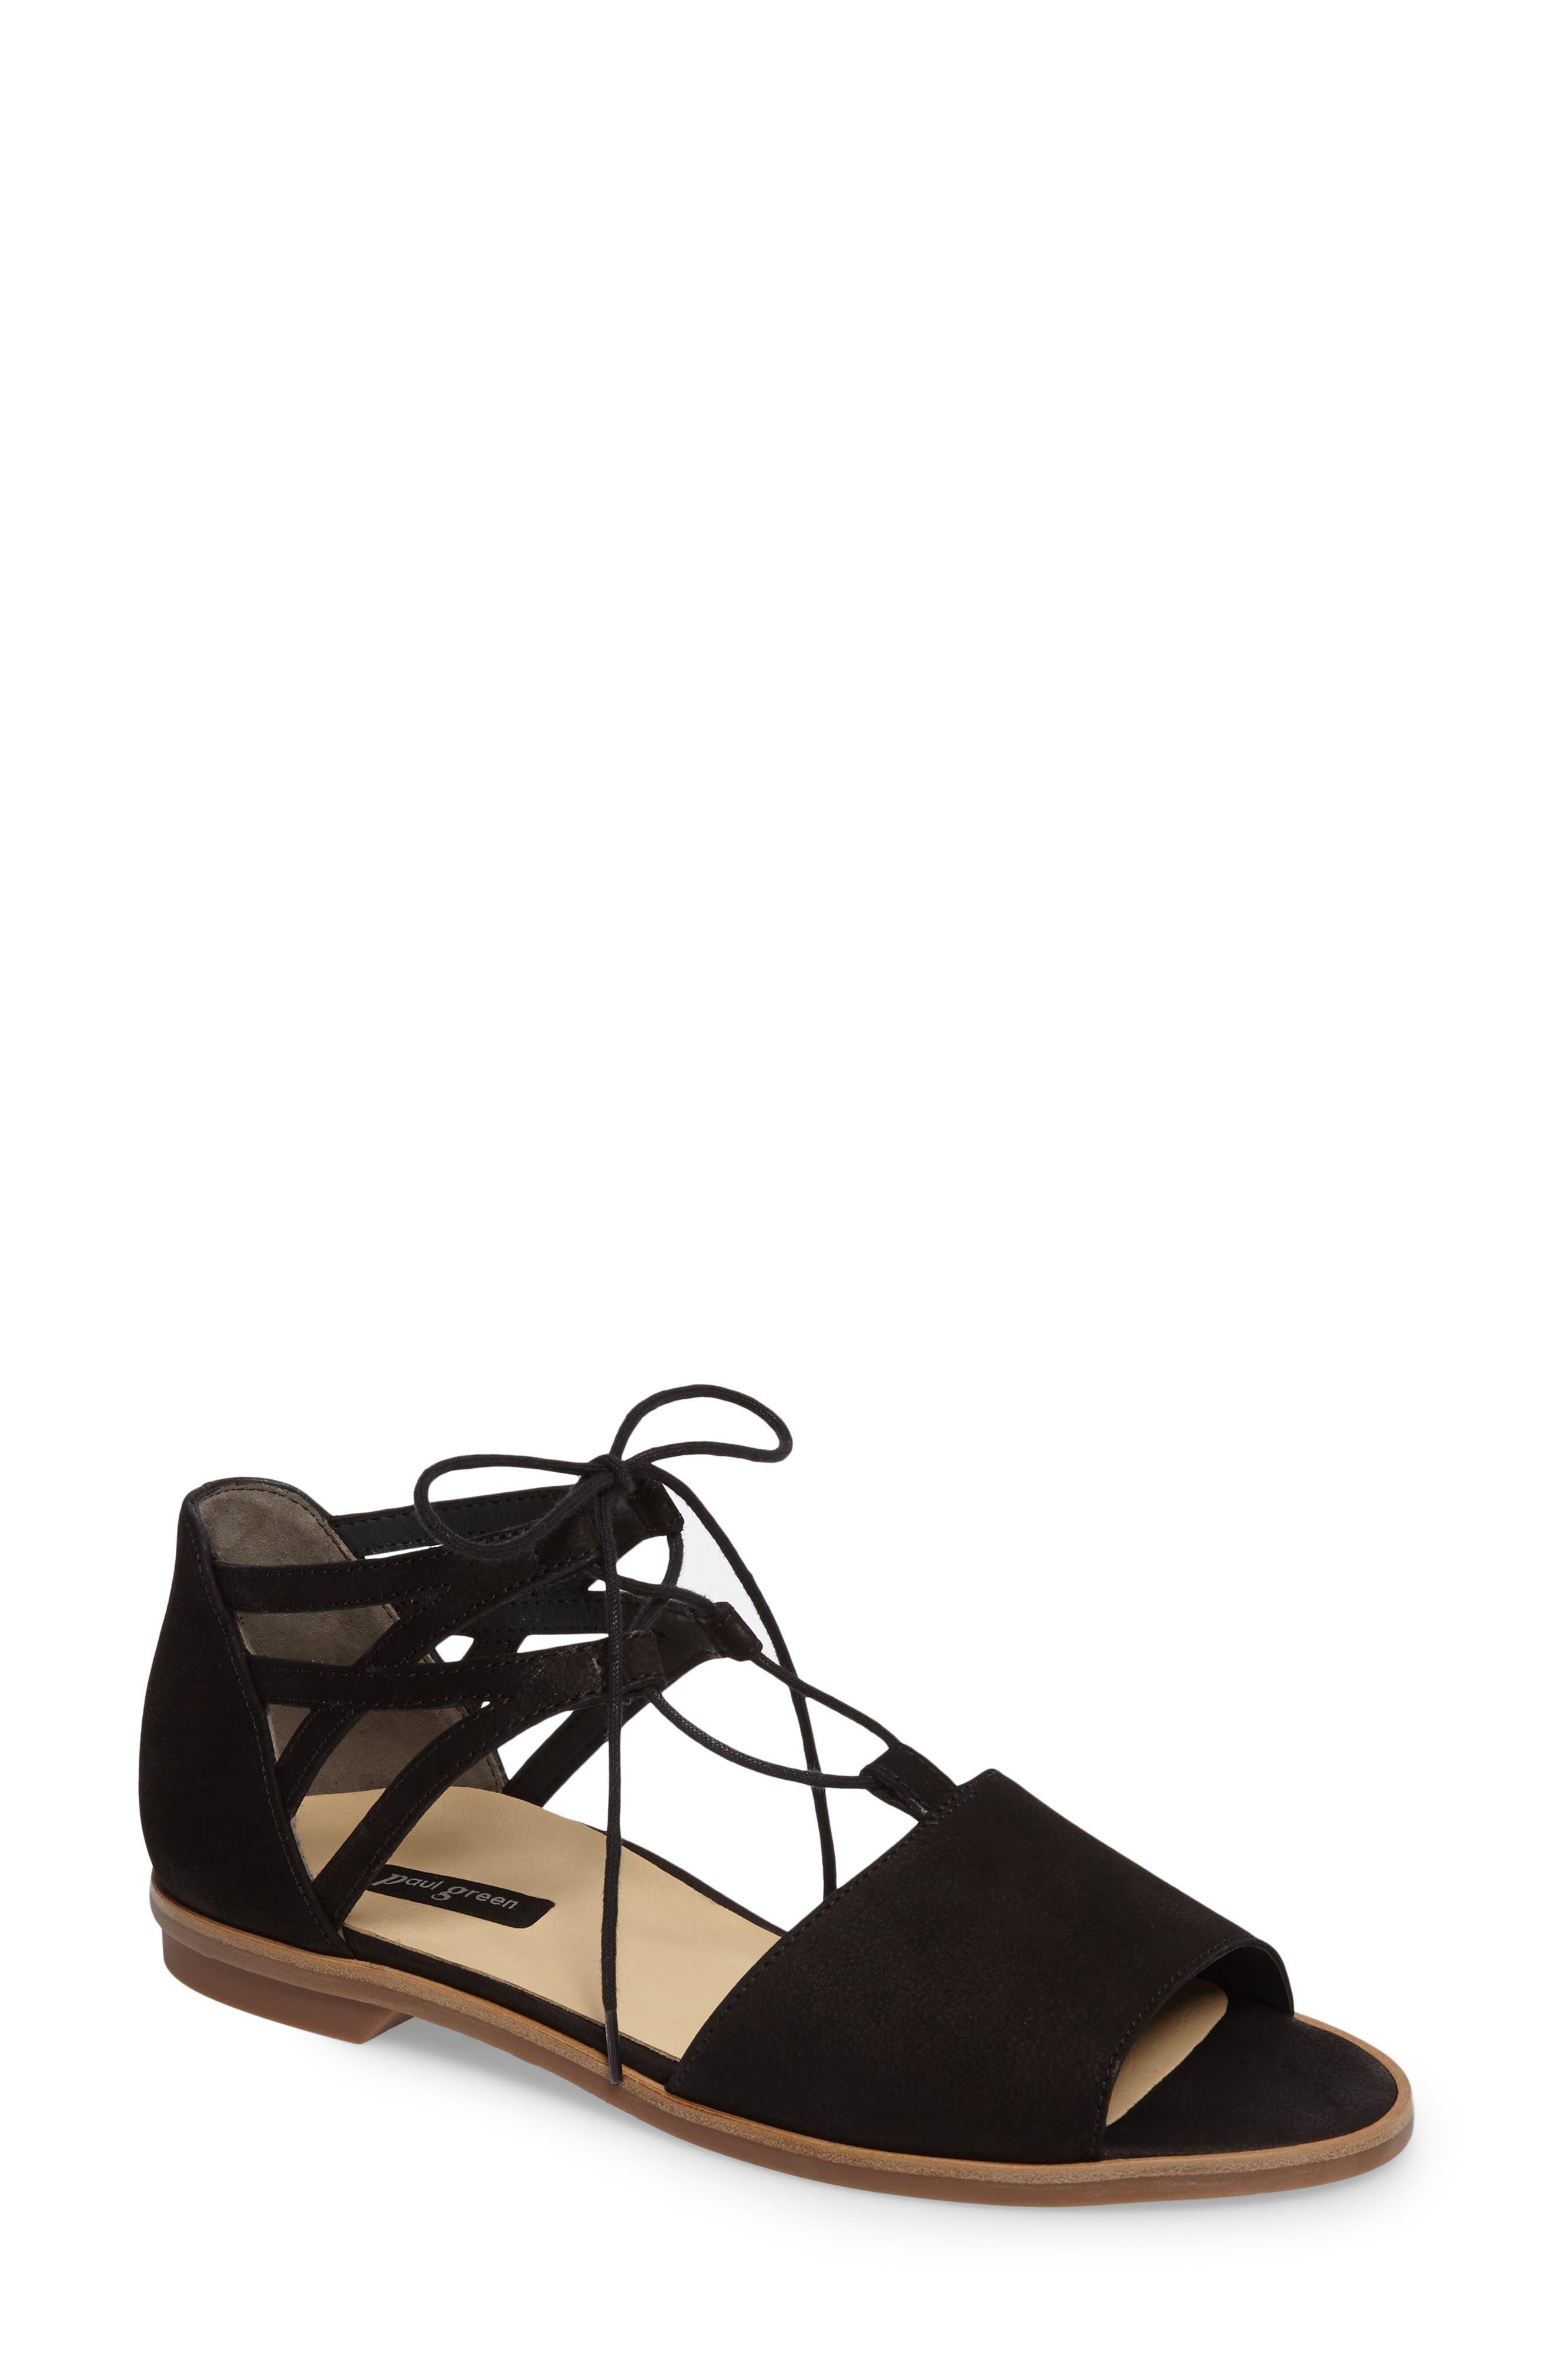 Main Image - Paul Green Morea Lace-Up Sandal (Women)